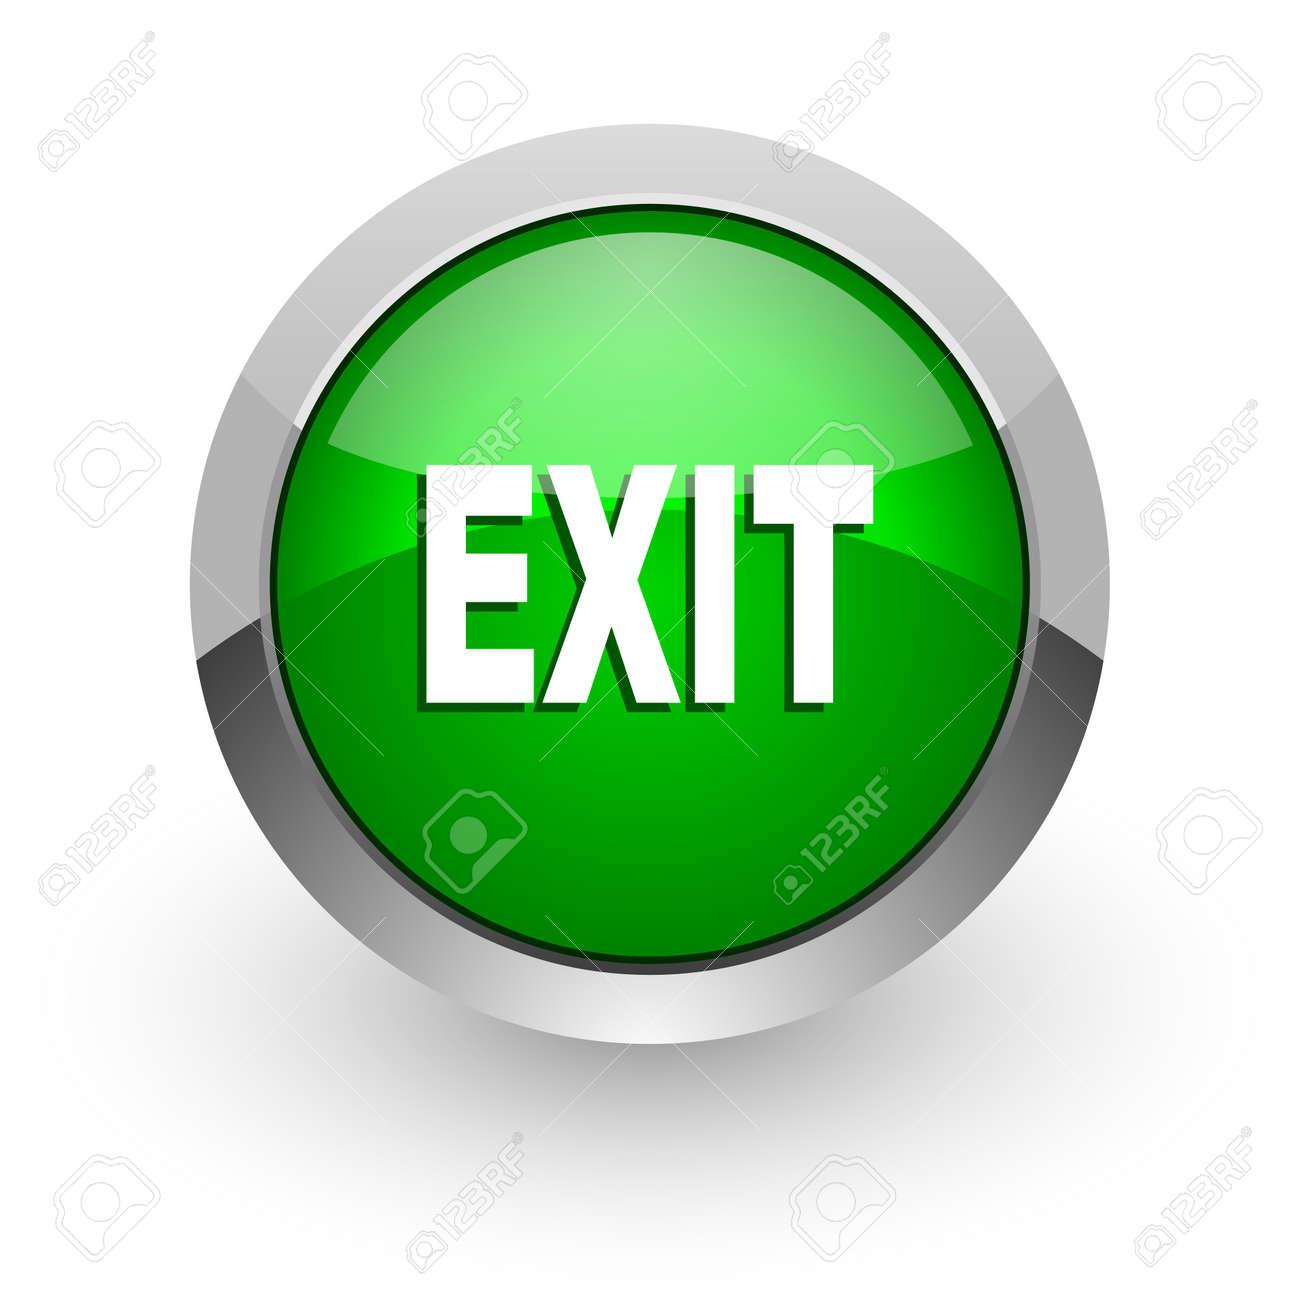 exit icon Stock Photo - 14471598